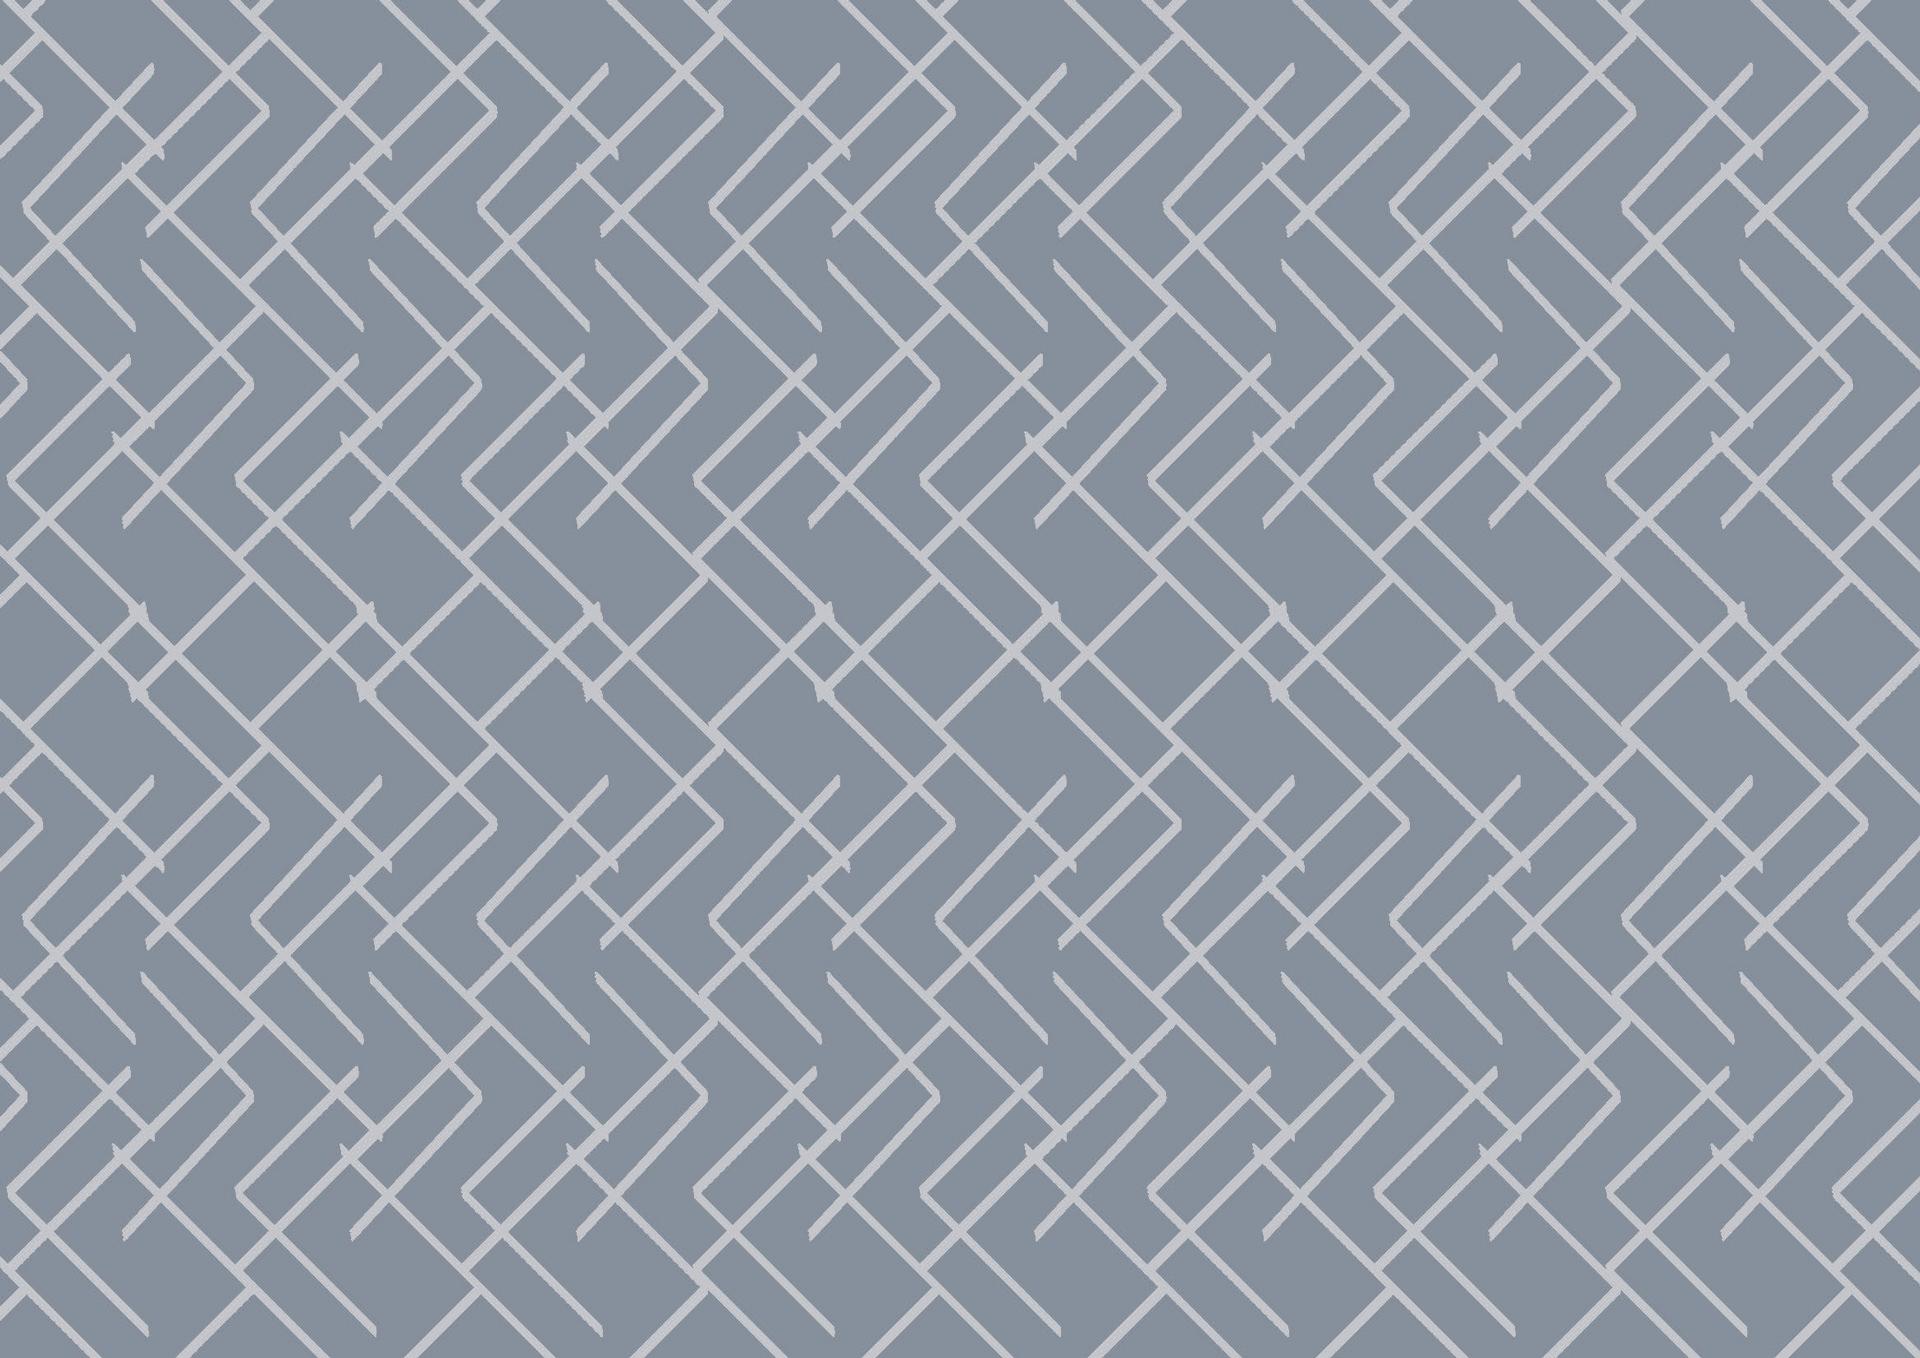 pattern_20